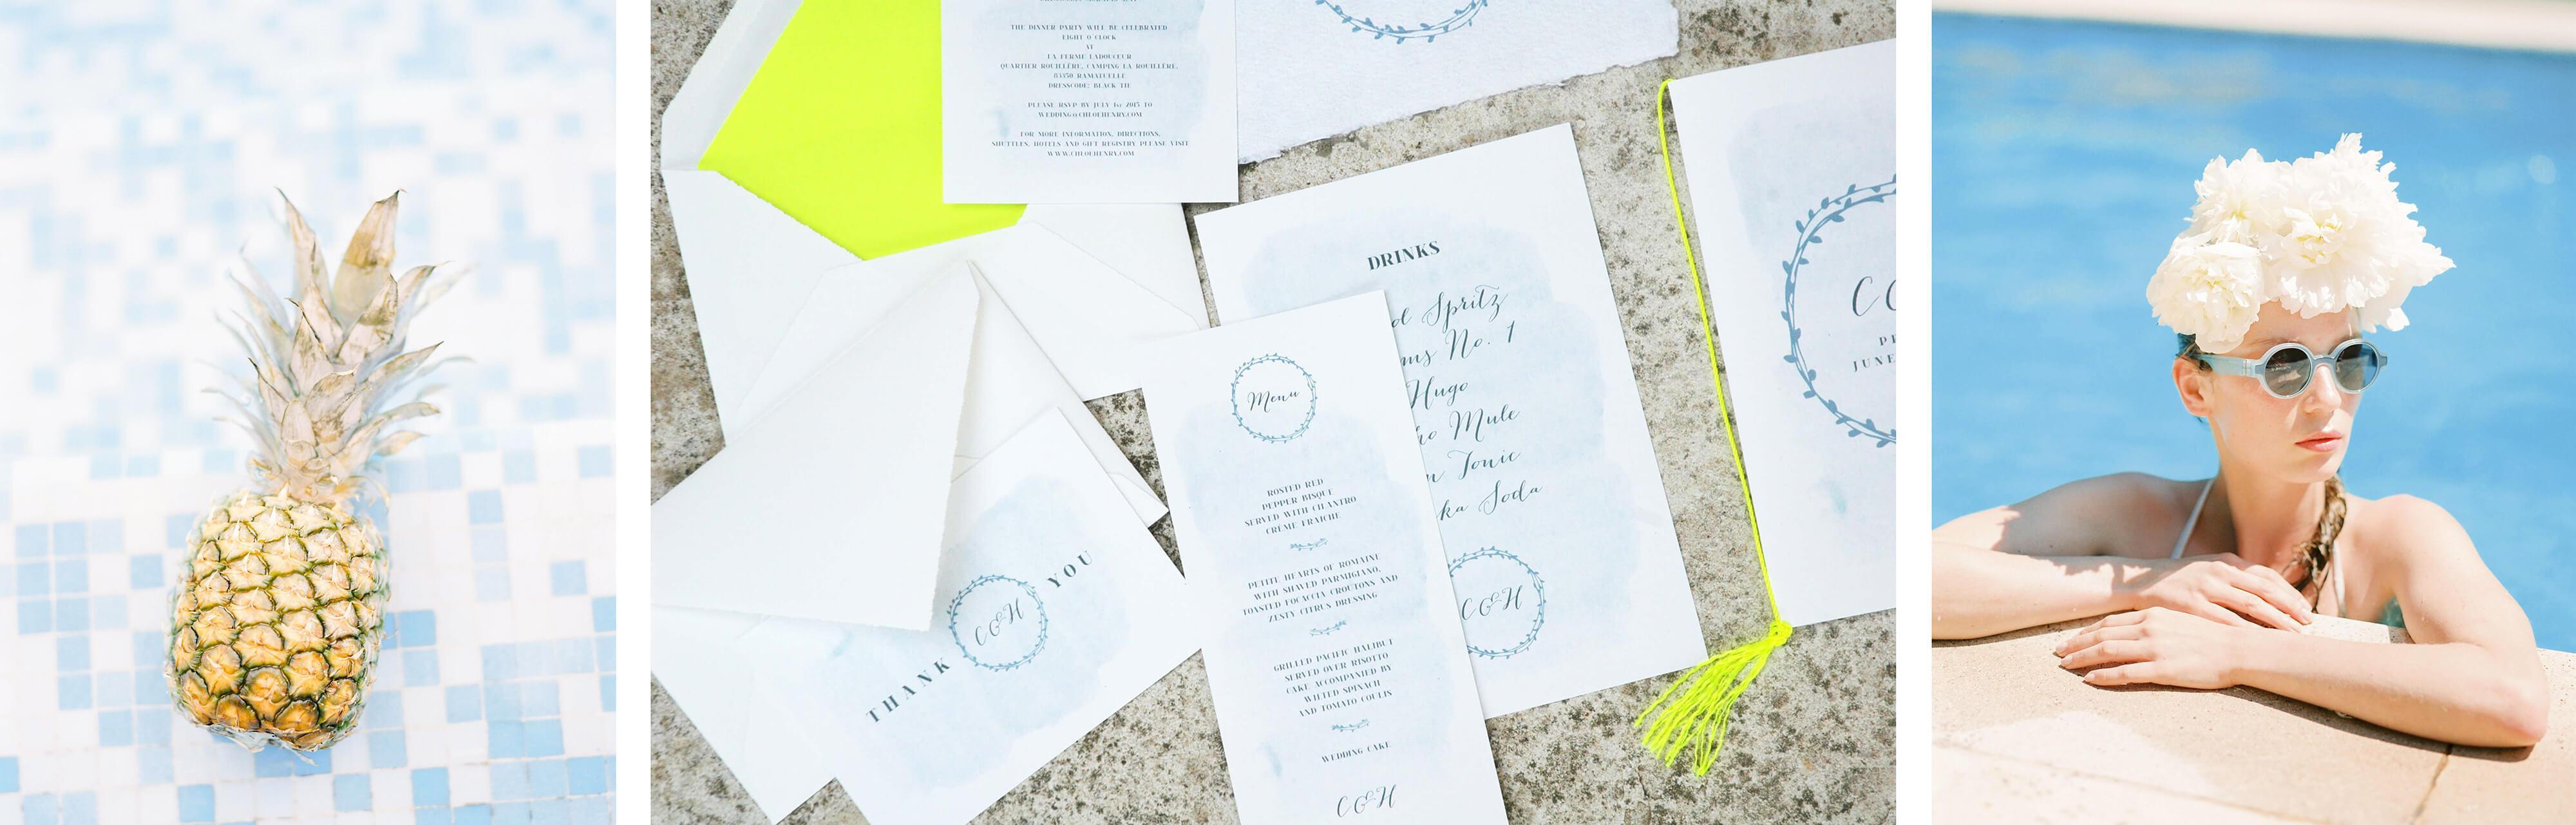 jungrad wedding design einladung poolparty saint tropez